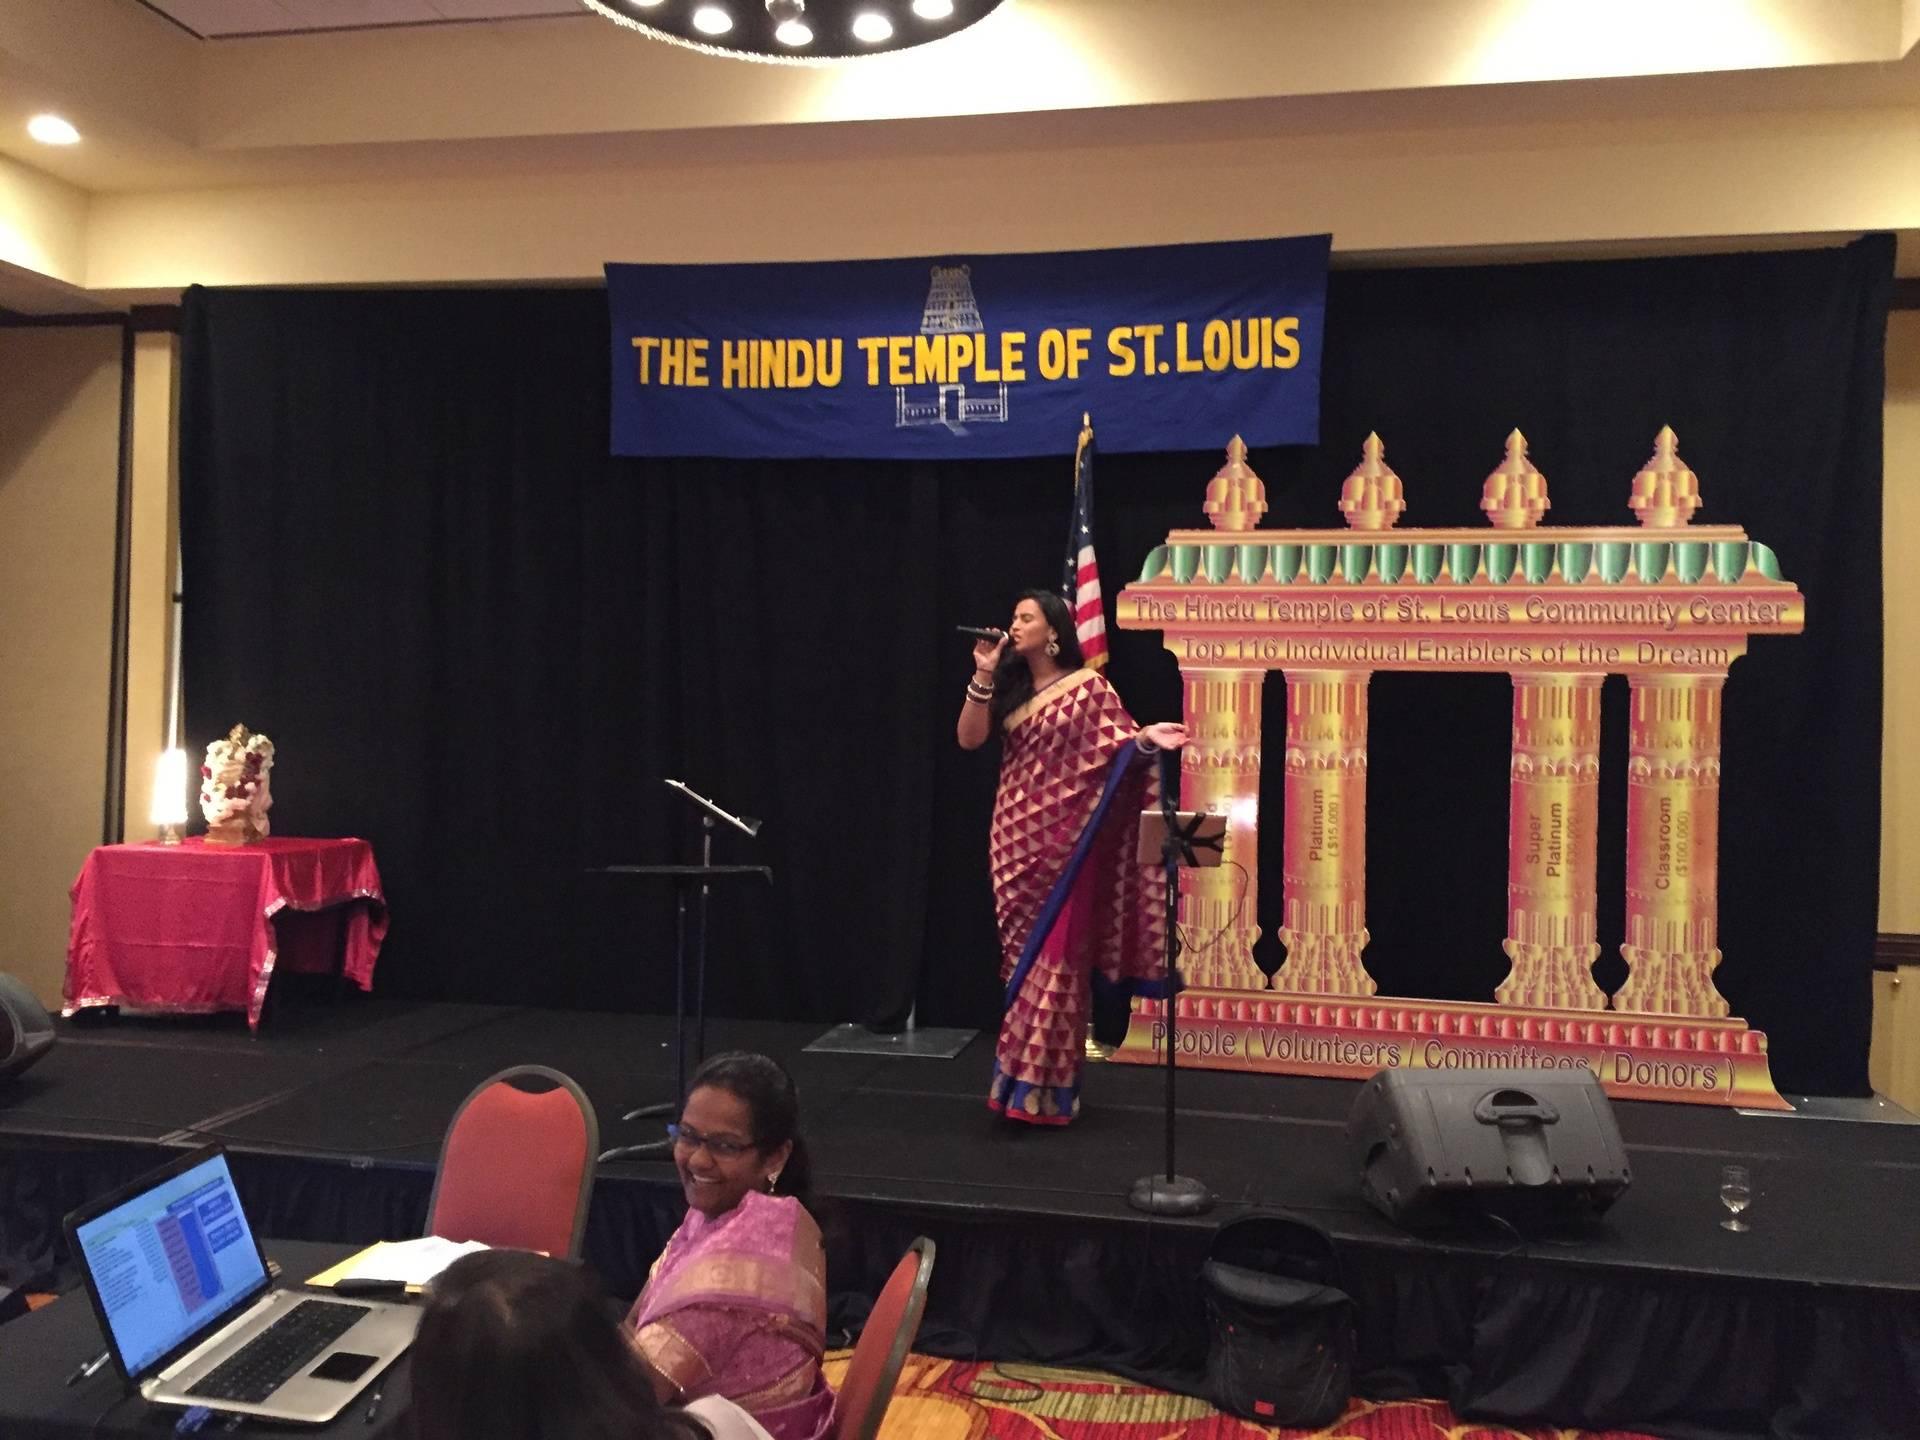 St Louis Hindu Temple Fund raising Show